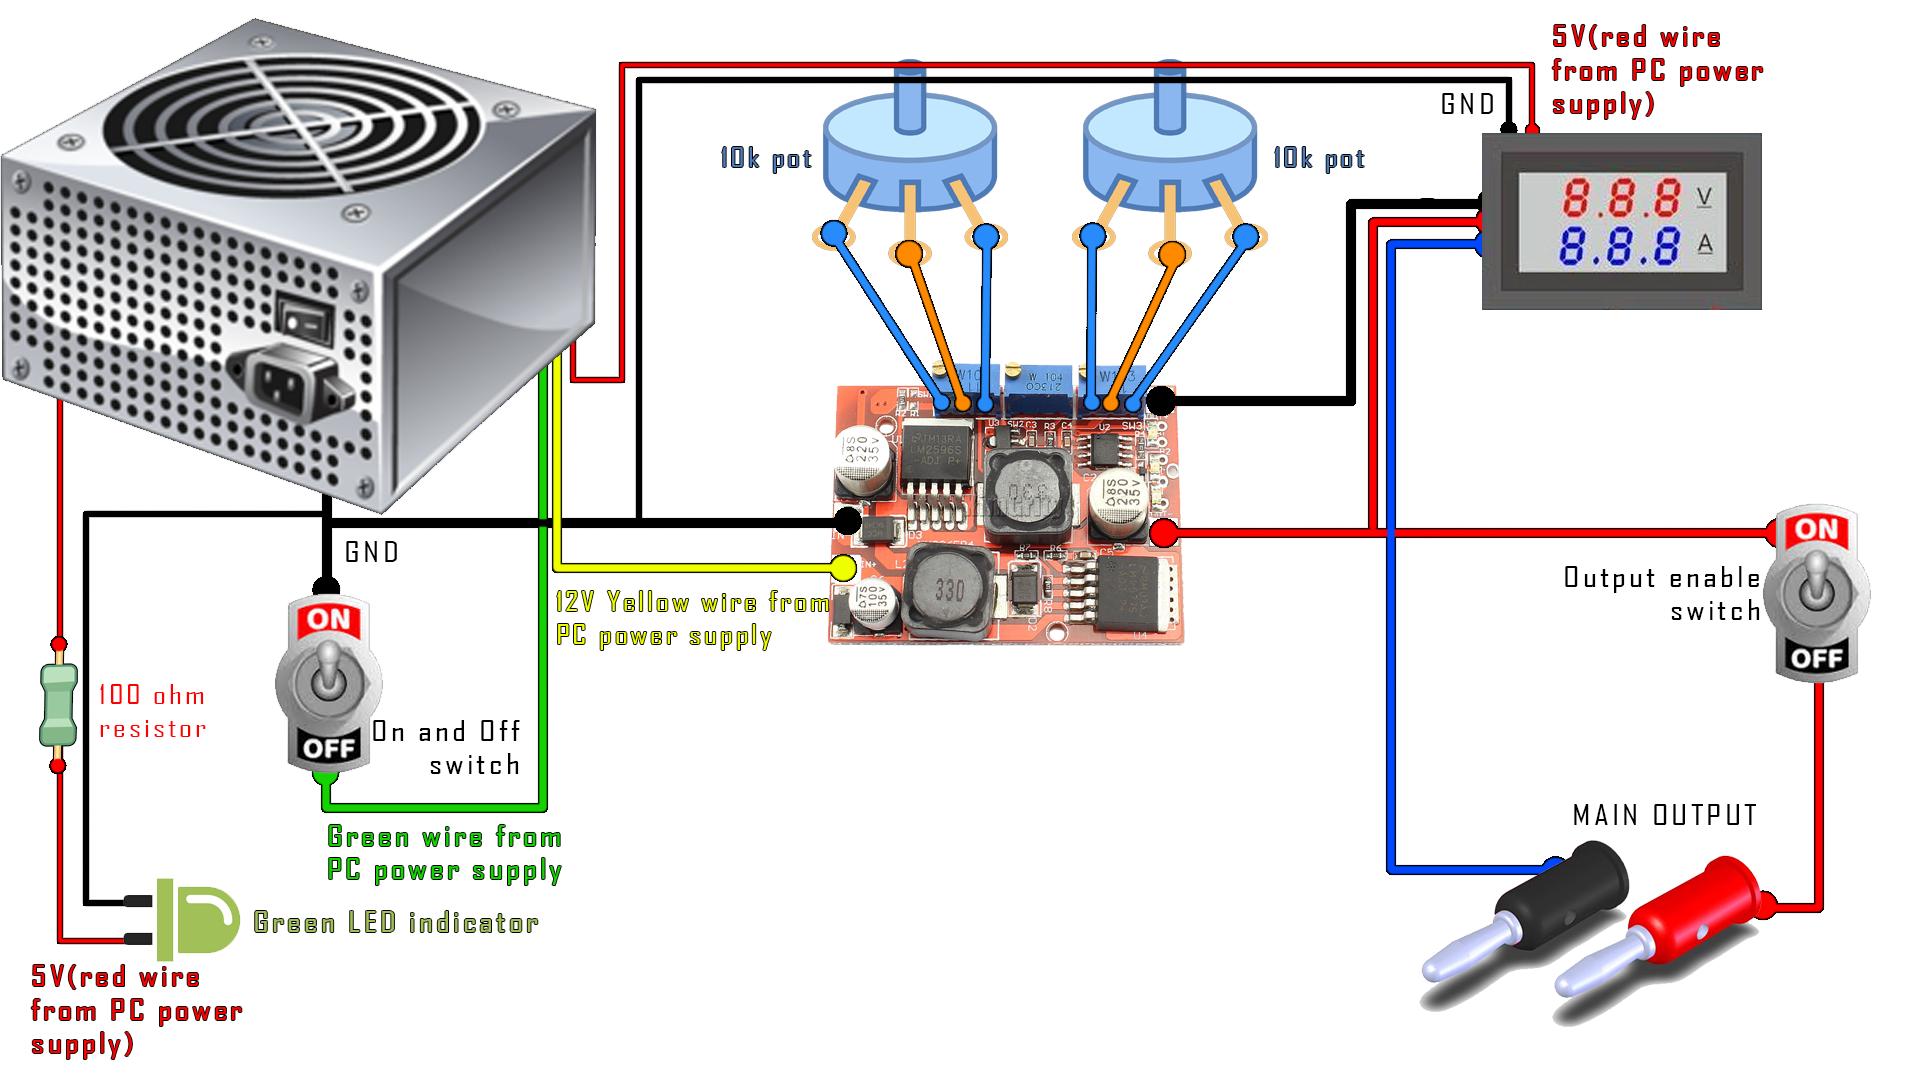 DIY power supply PC boost buck converter displayElectronoobs